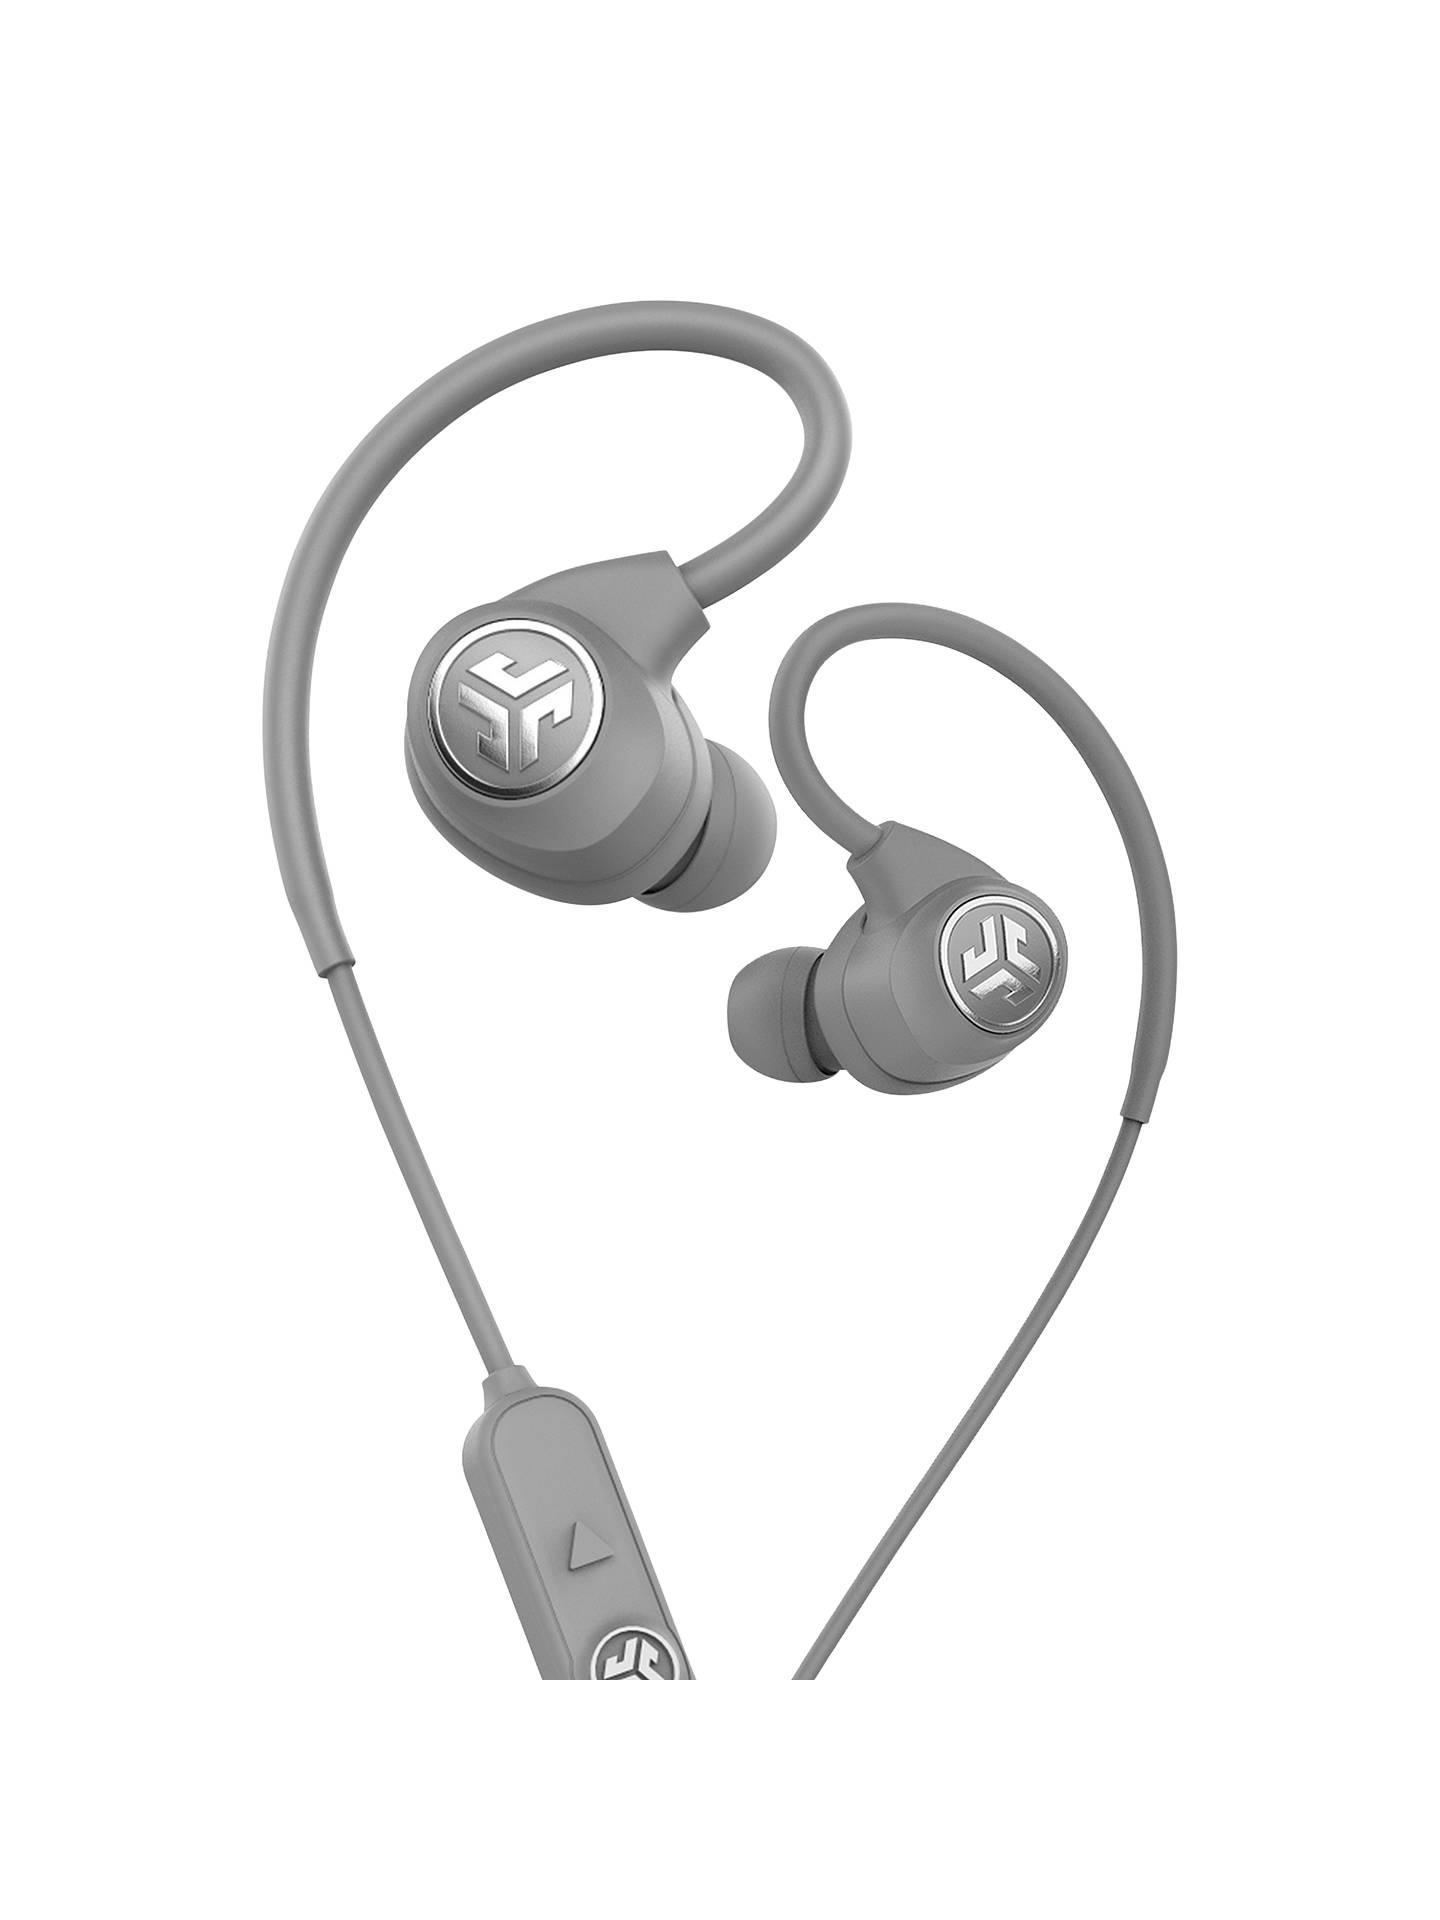 8c123d554a5 Buy JLab Audio Epic Sport Sweat & Weather-Resistant Wireless Bluetooth  In-Ear Headphones ...